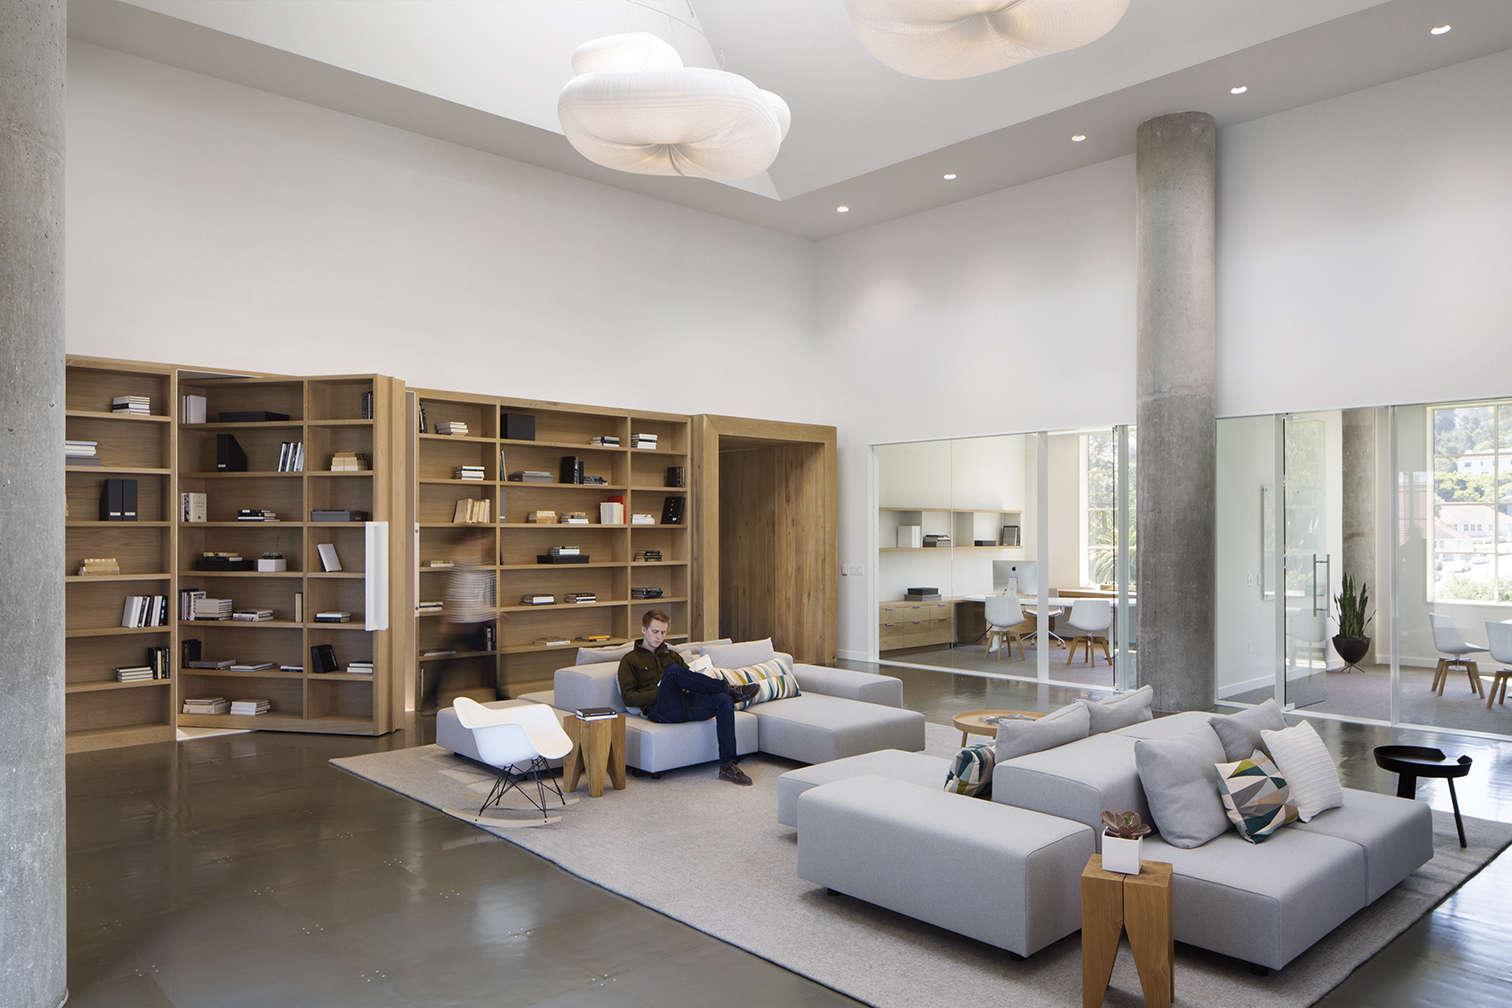 feldman architecture founders office 2 remodelista 14